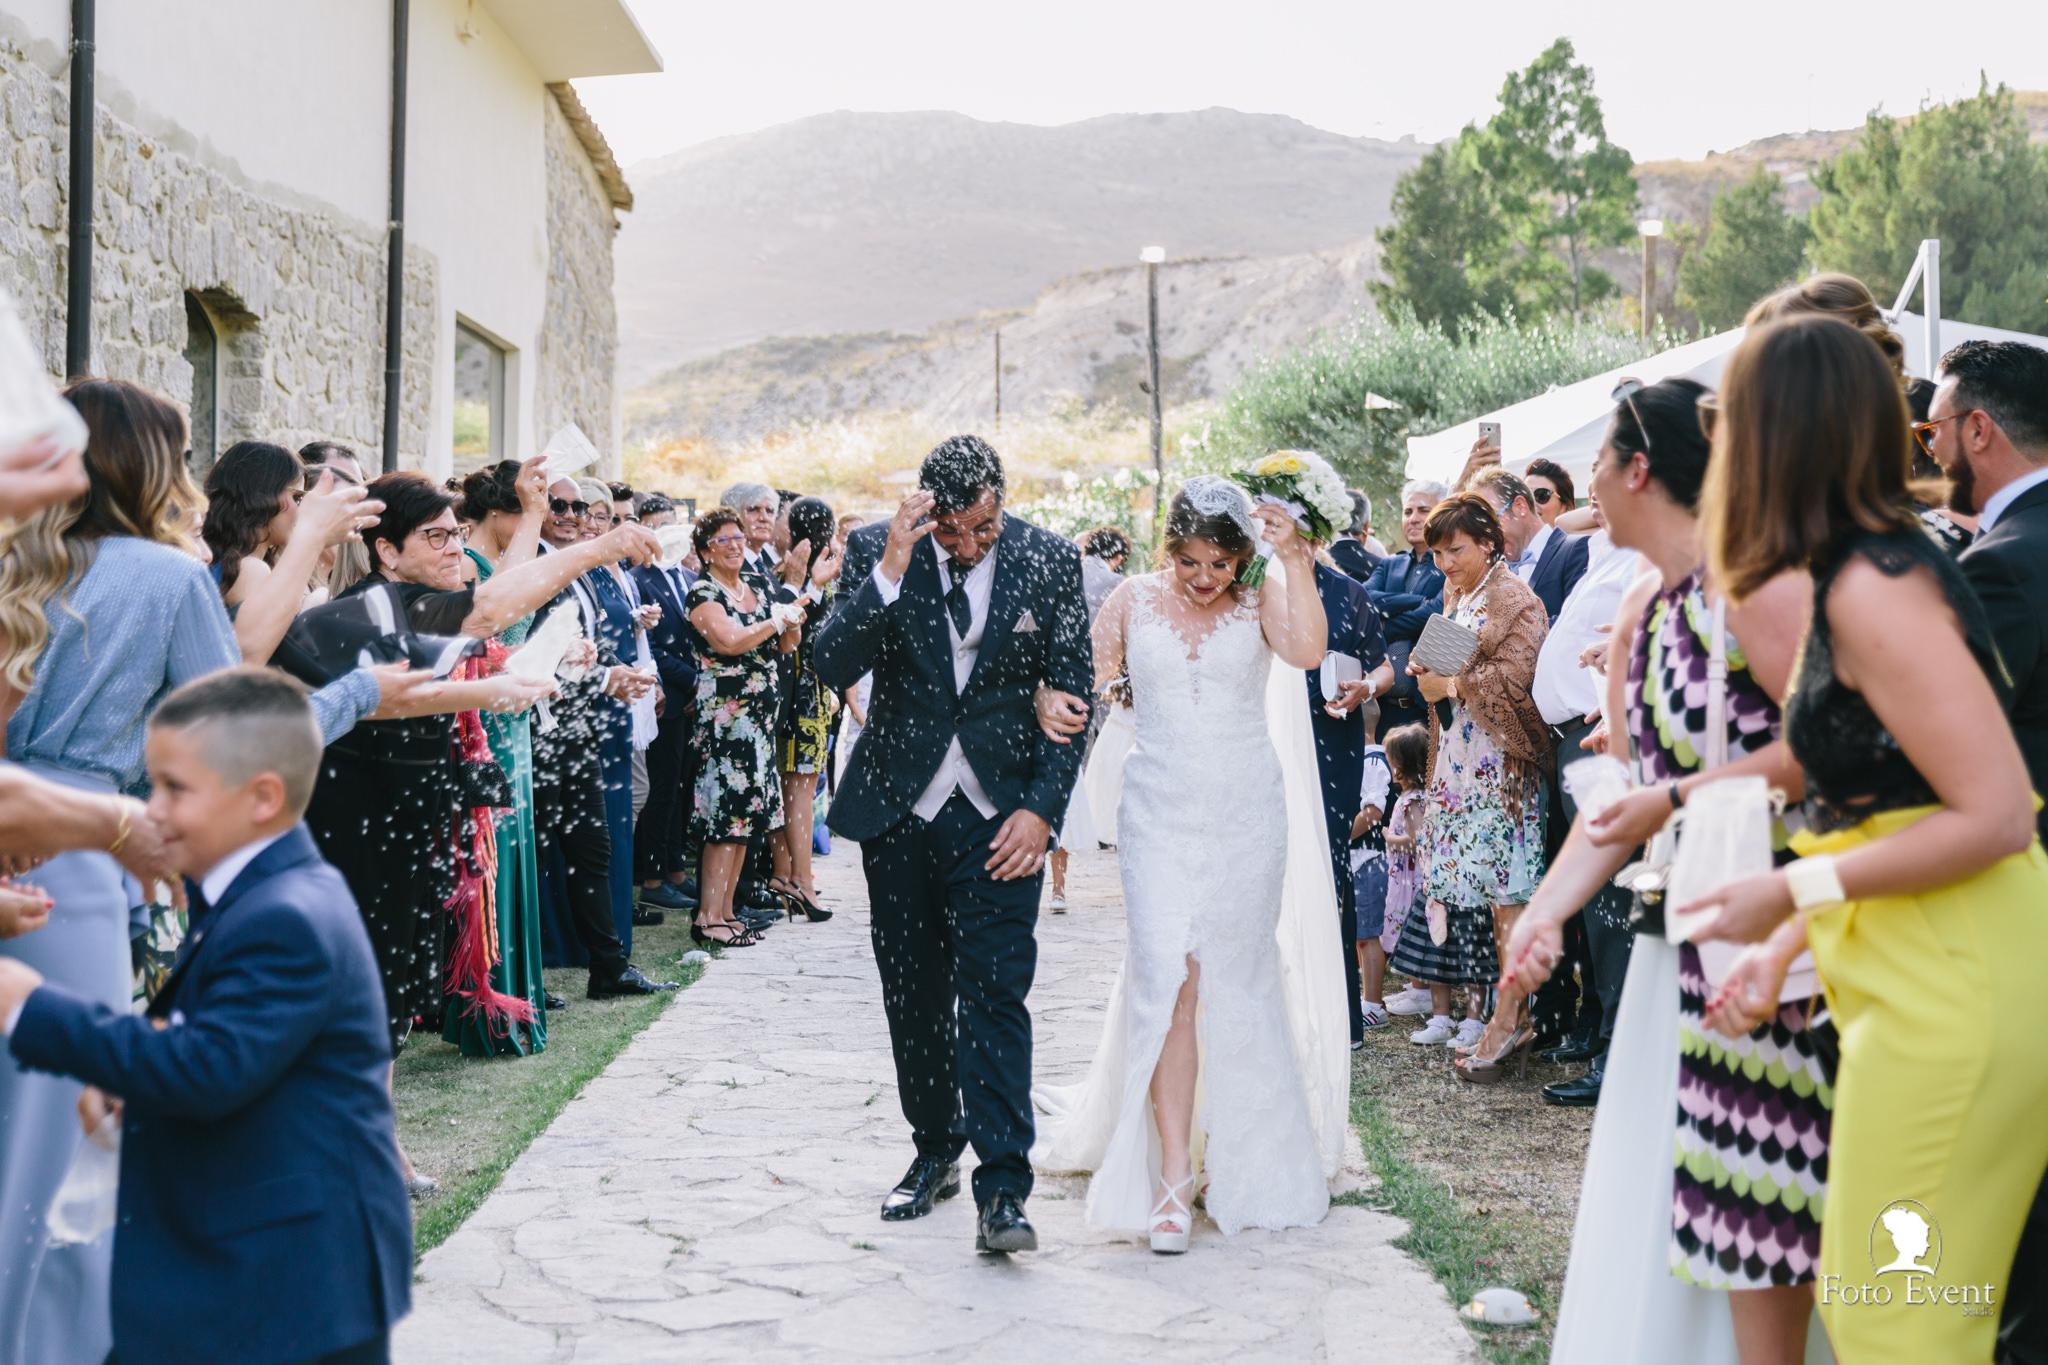 028-2019-06-12-Matrimonio-Rosa-e-Angelo-Ripellino-5DE-1122